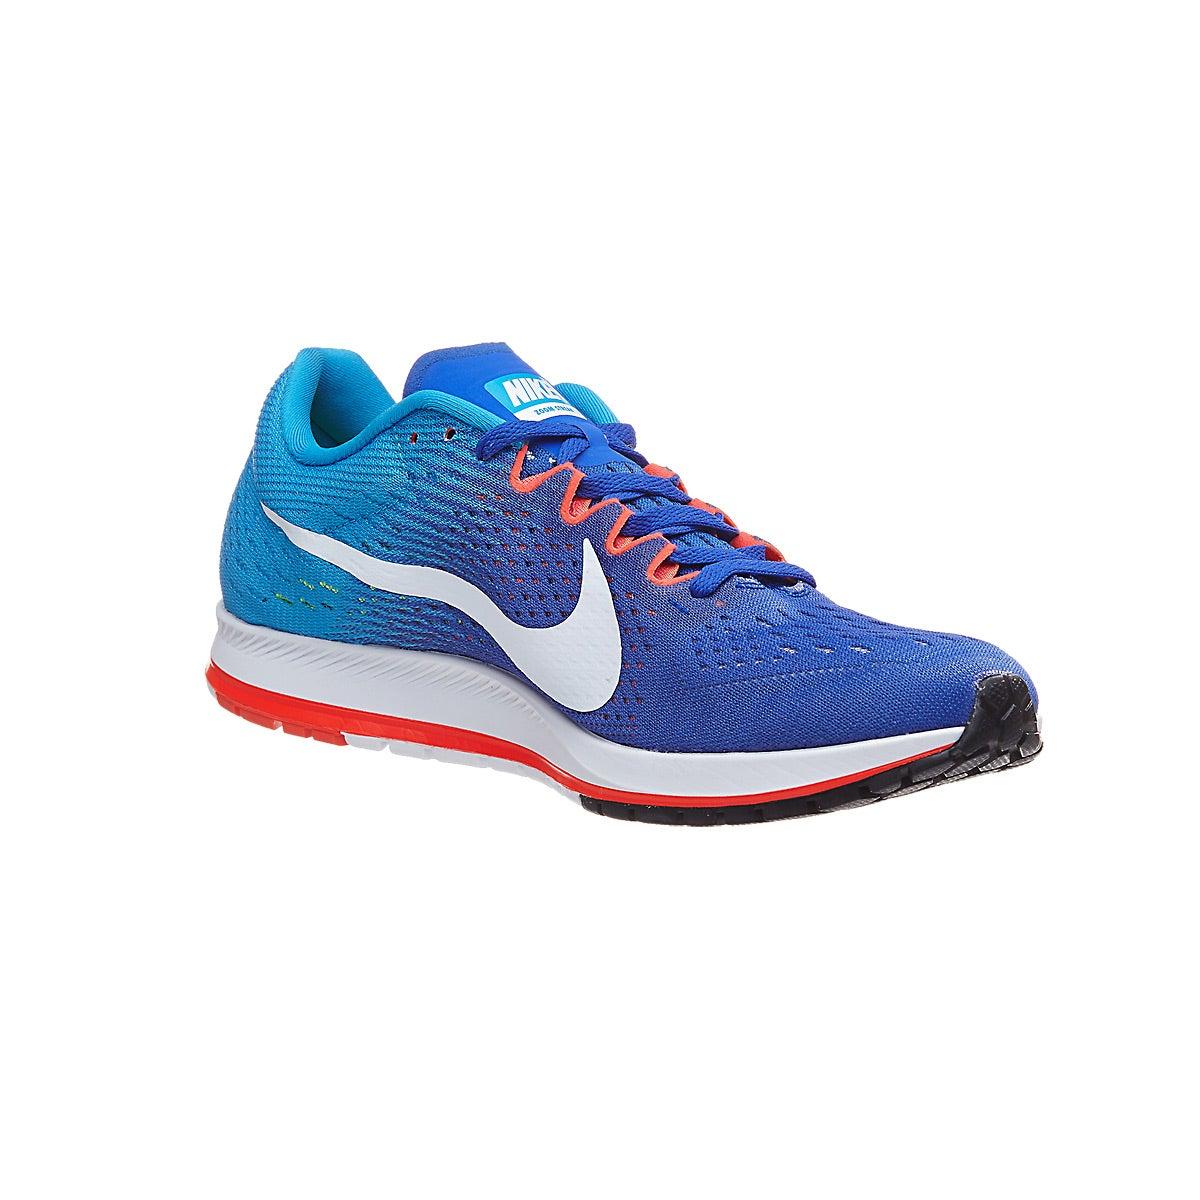 Running Shoes Warehouse Sydney